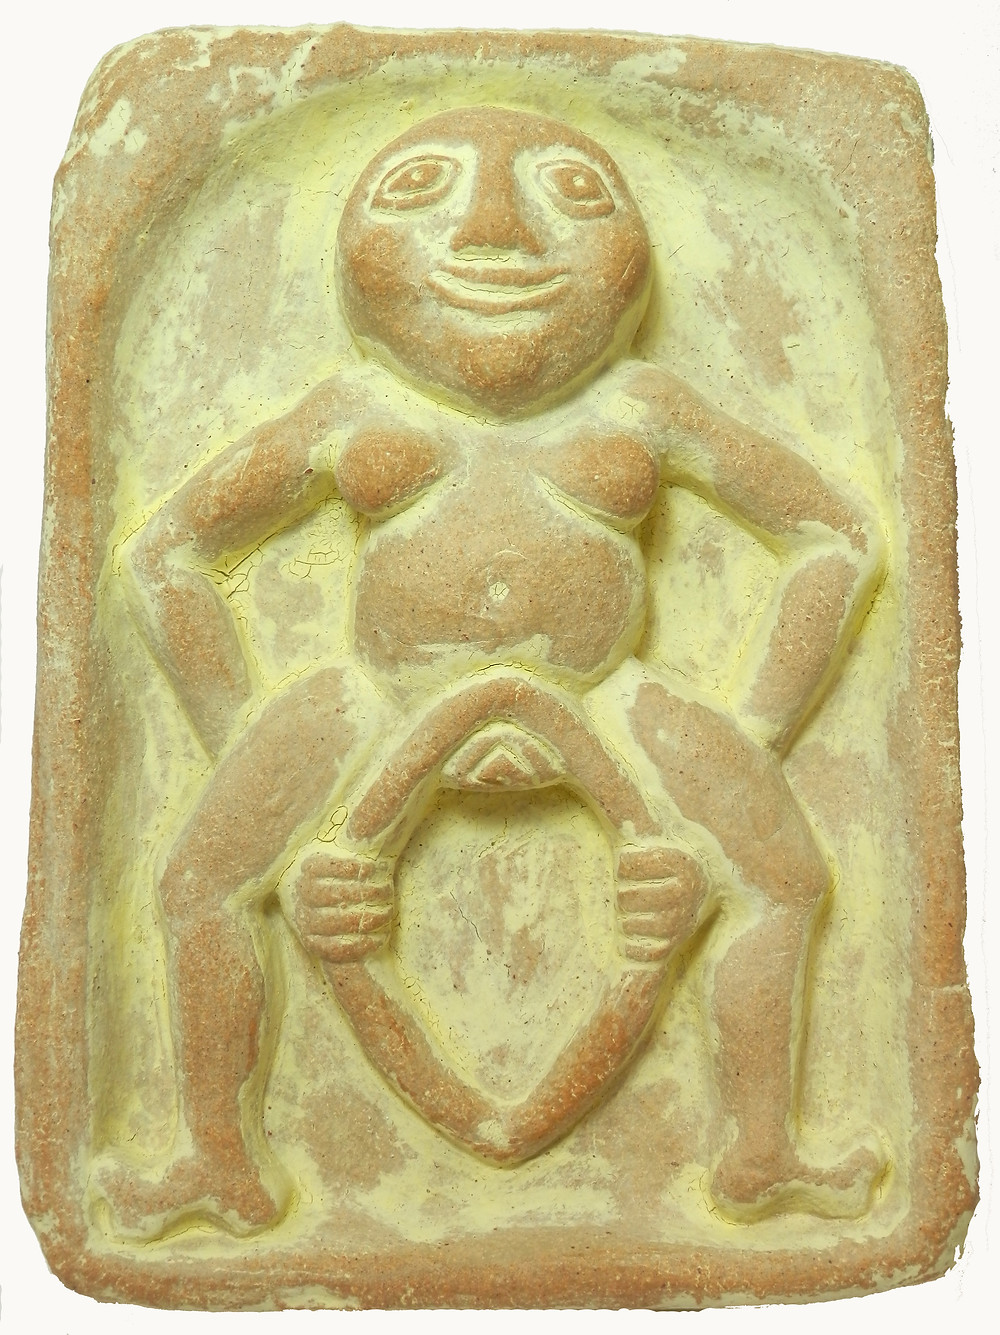 Sheila-na-Gig Celtic Goddess, the last of her kind!